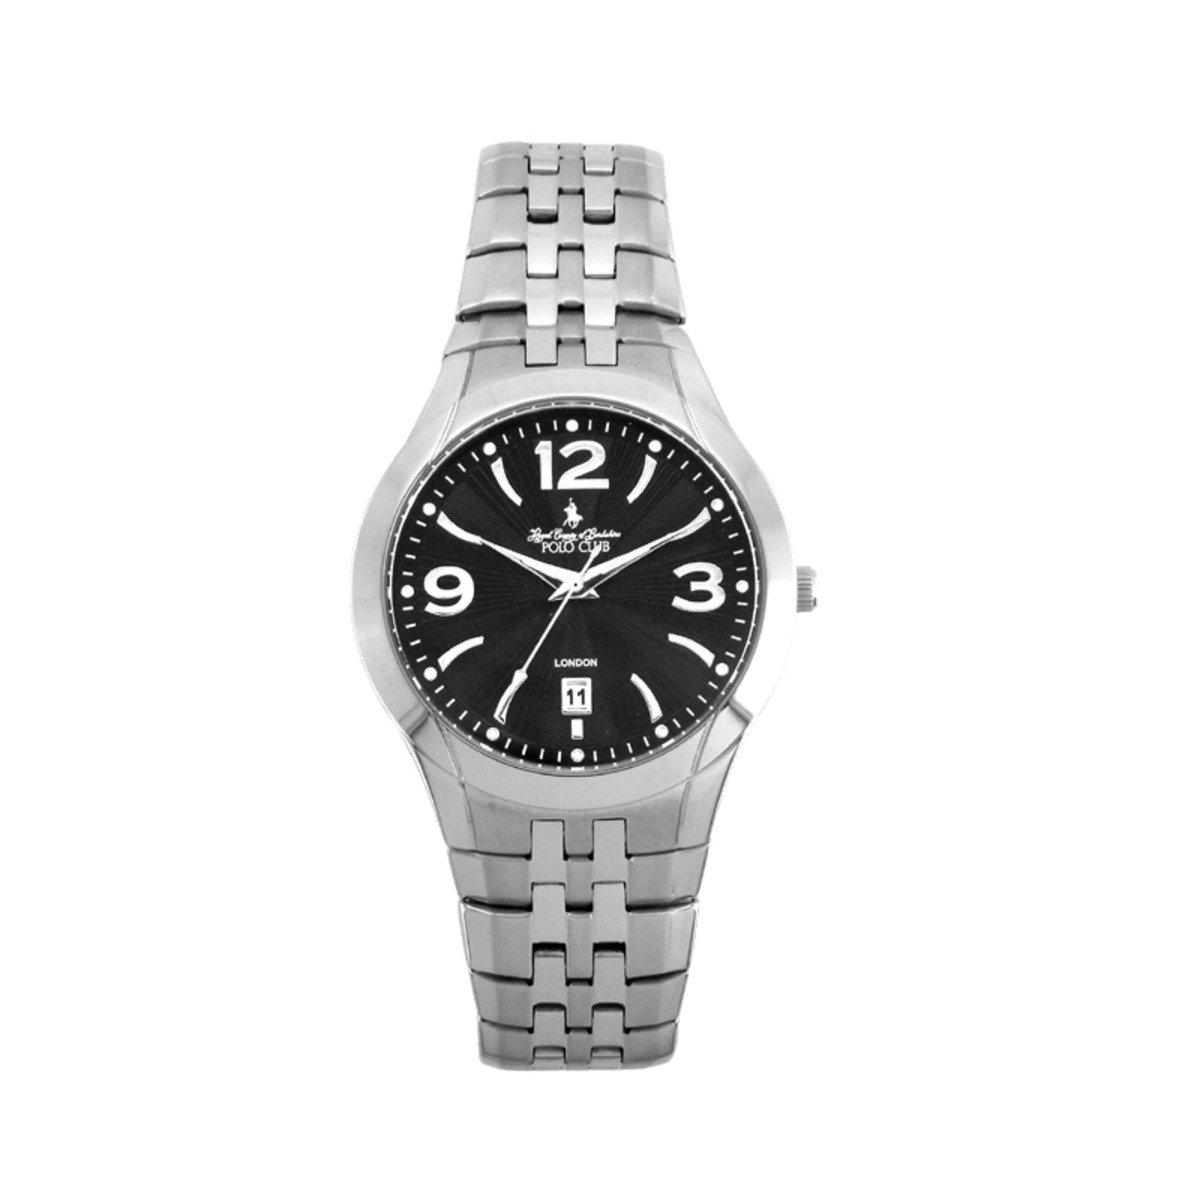 PL118-663BK-B Watch